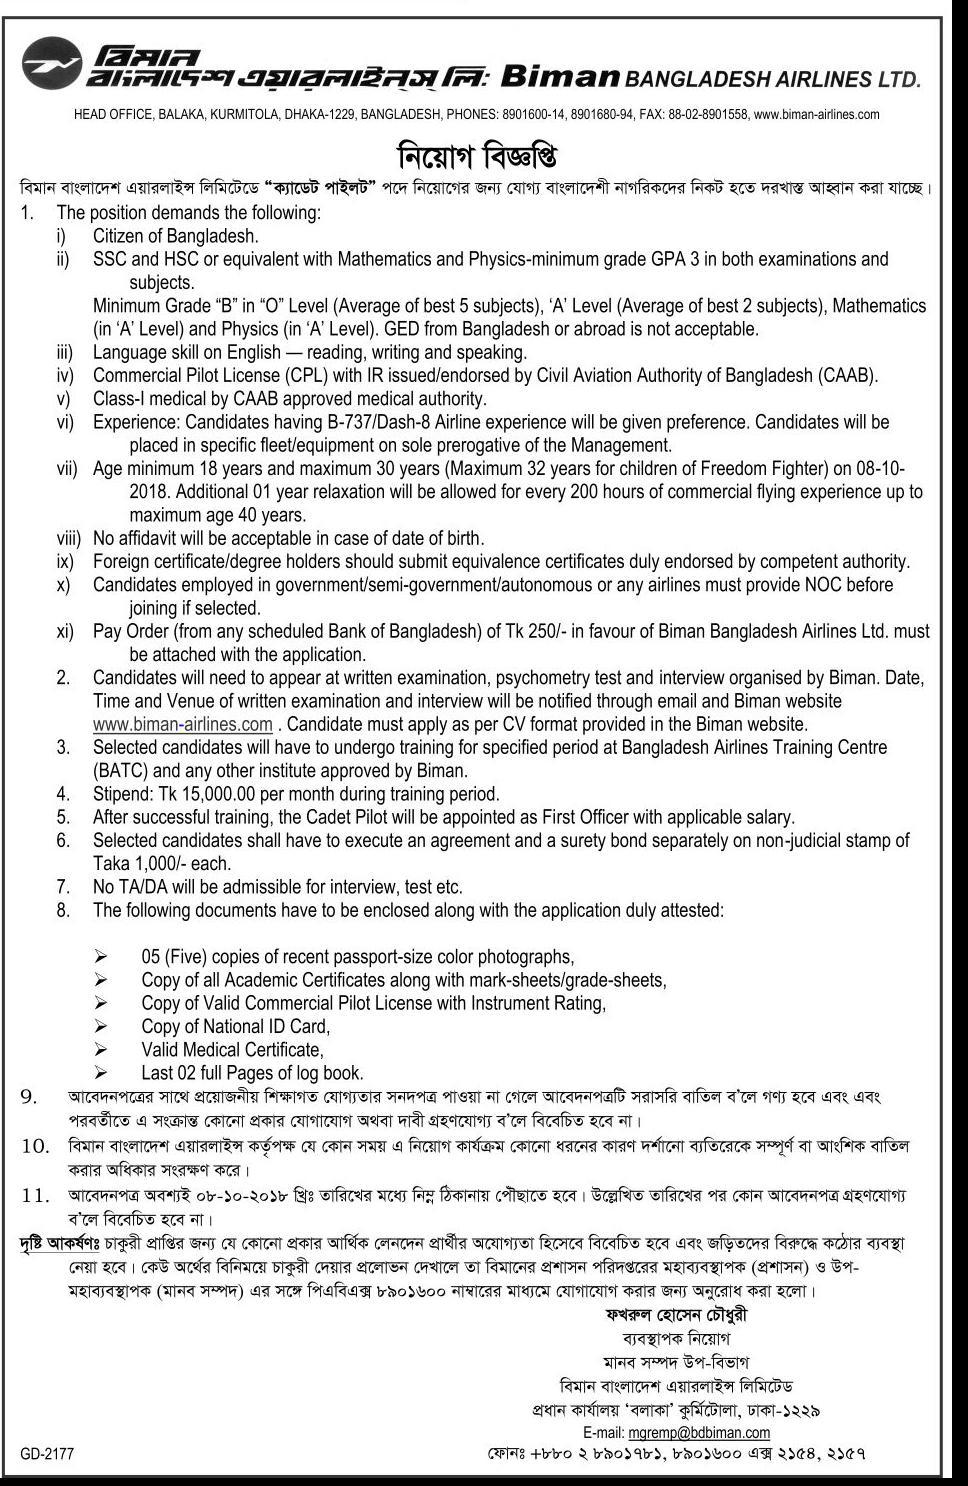 Biman Bangladesh Airlines Ltd job circular 2018